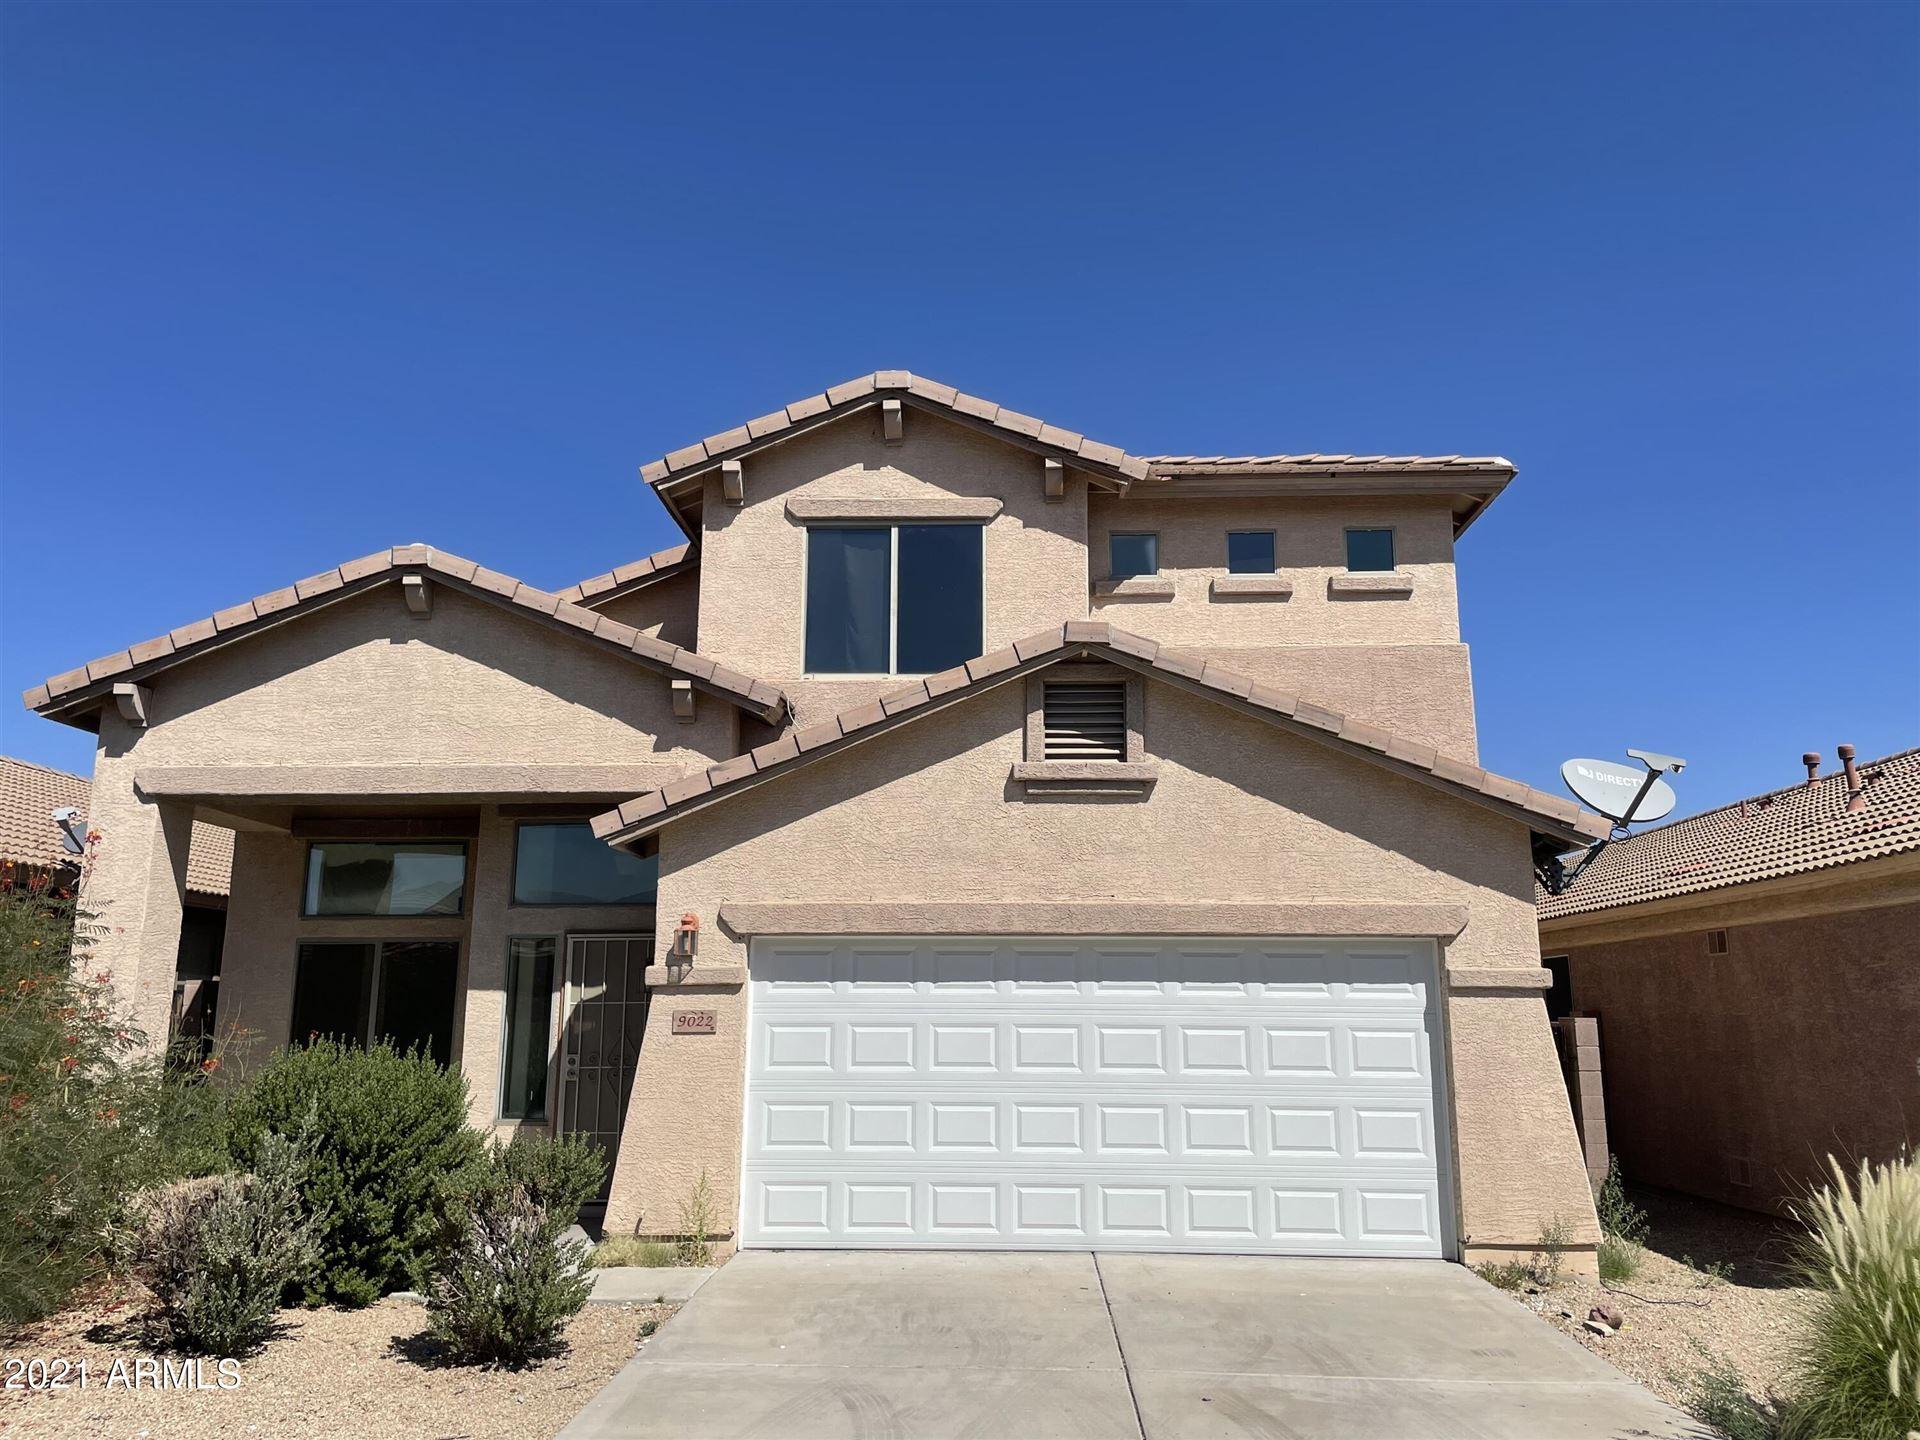 Photo of 9022 W VILLA MARIA Drive, Peoria, AZ 85382 (MLS # 6295067)